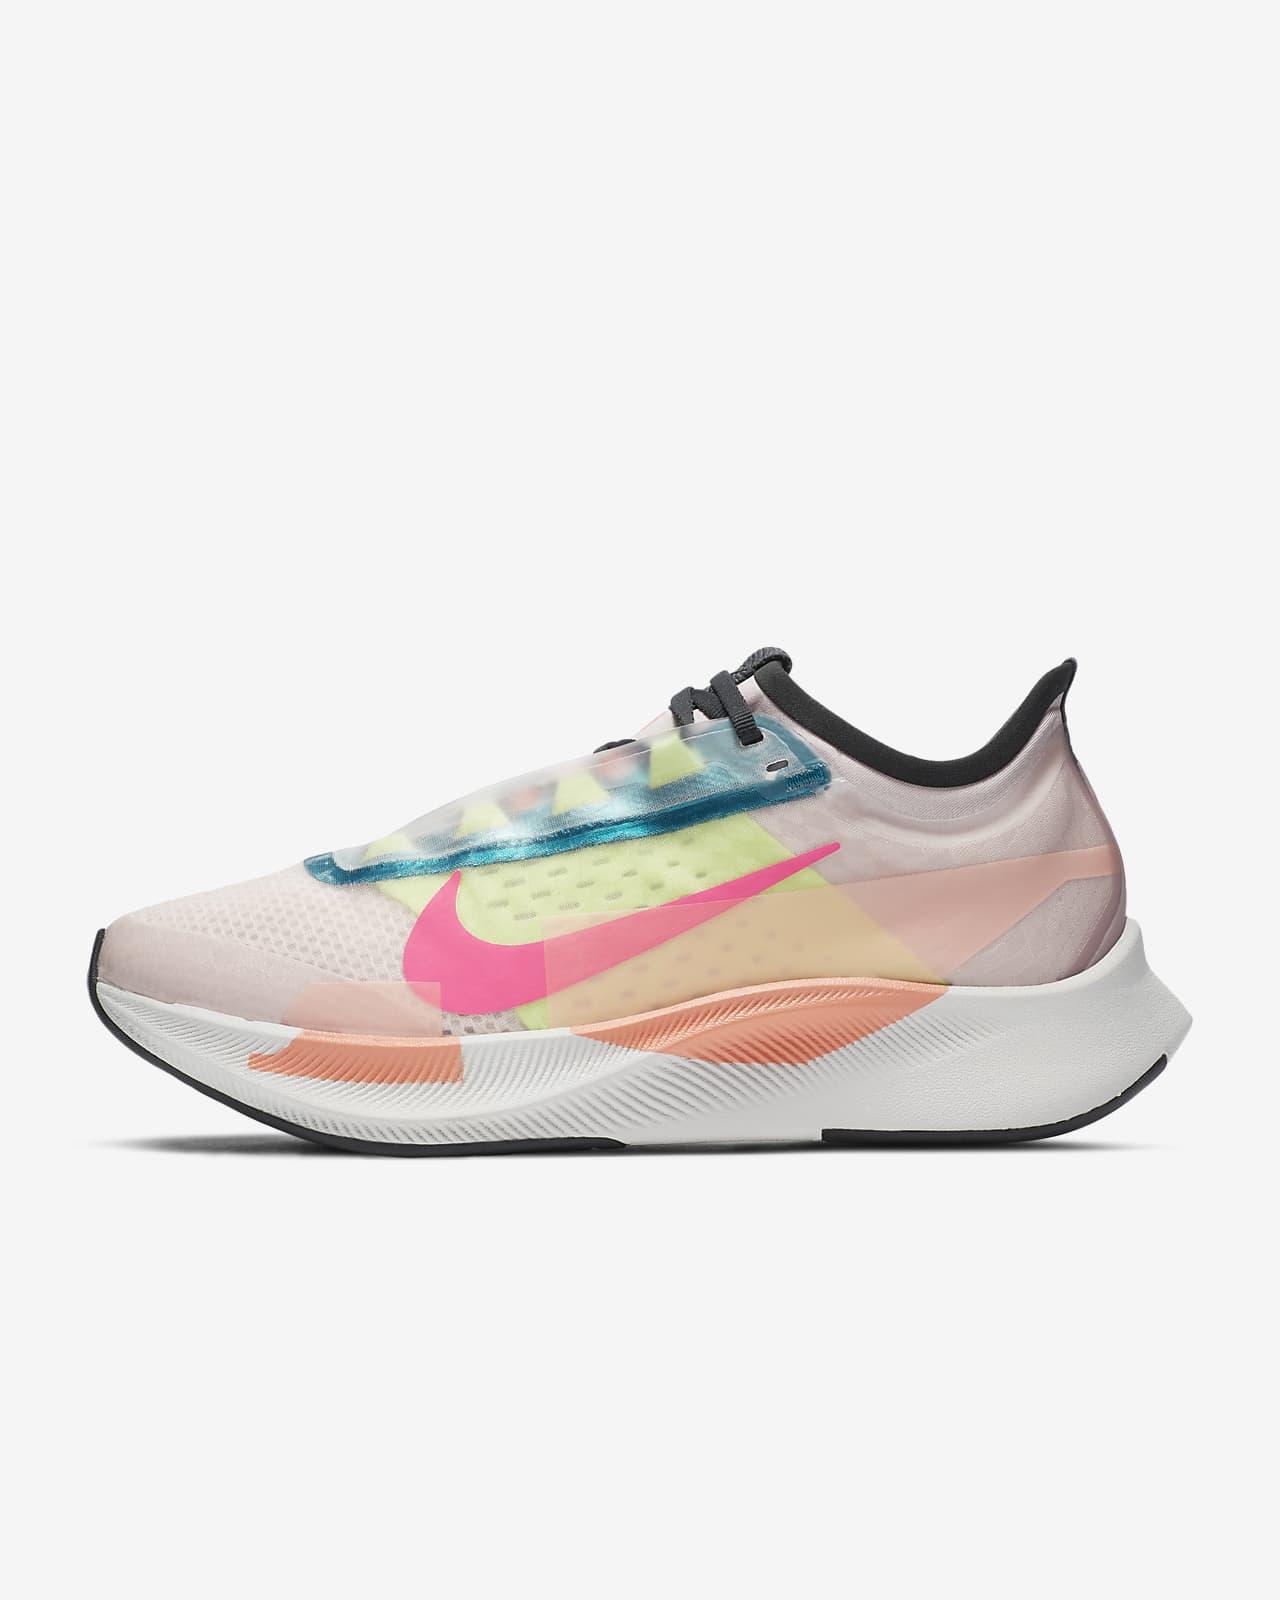 nike womens running shoes pink